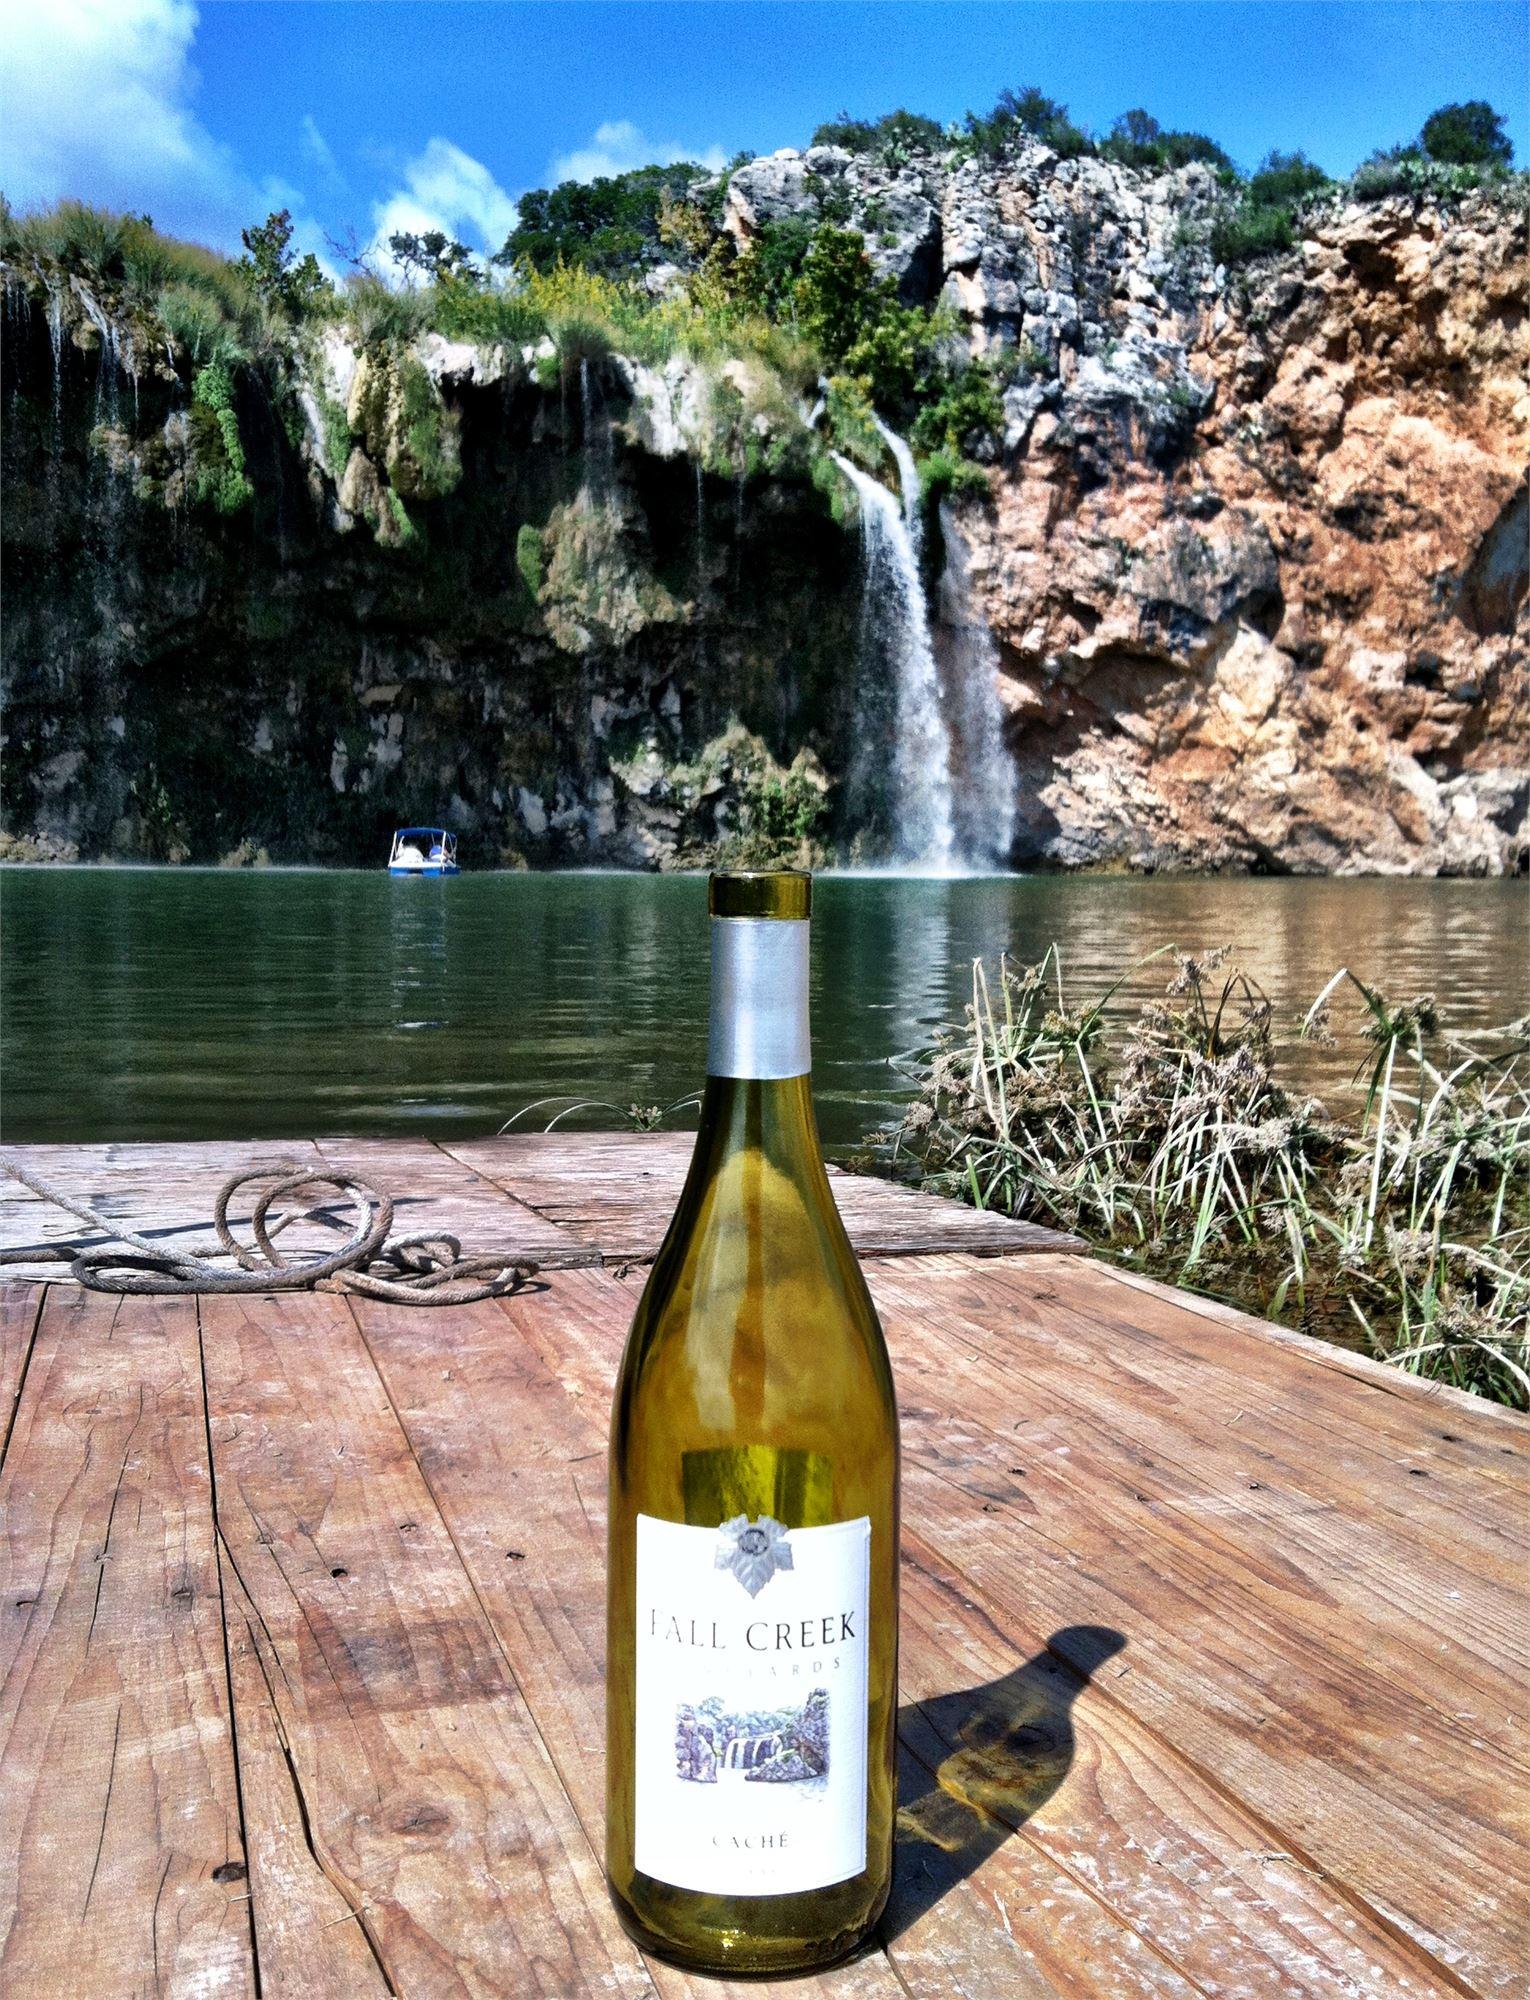 fall_creek_vineyards.jpg